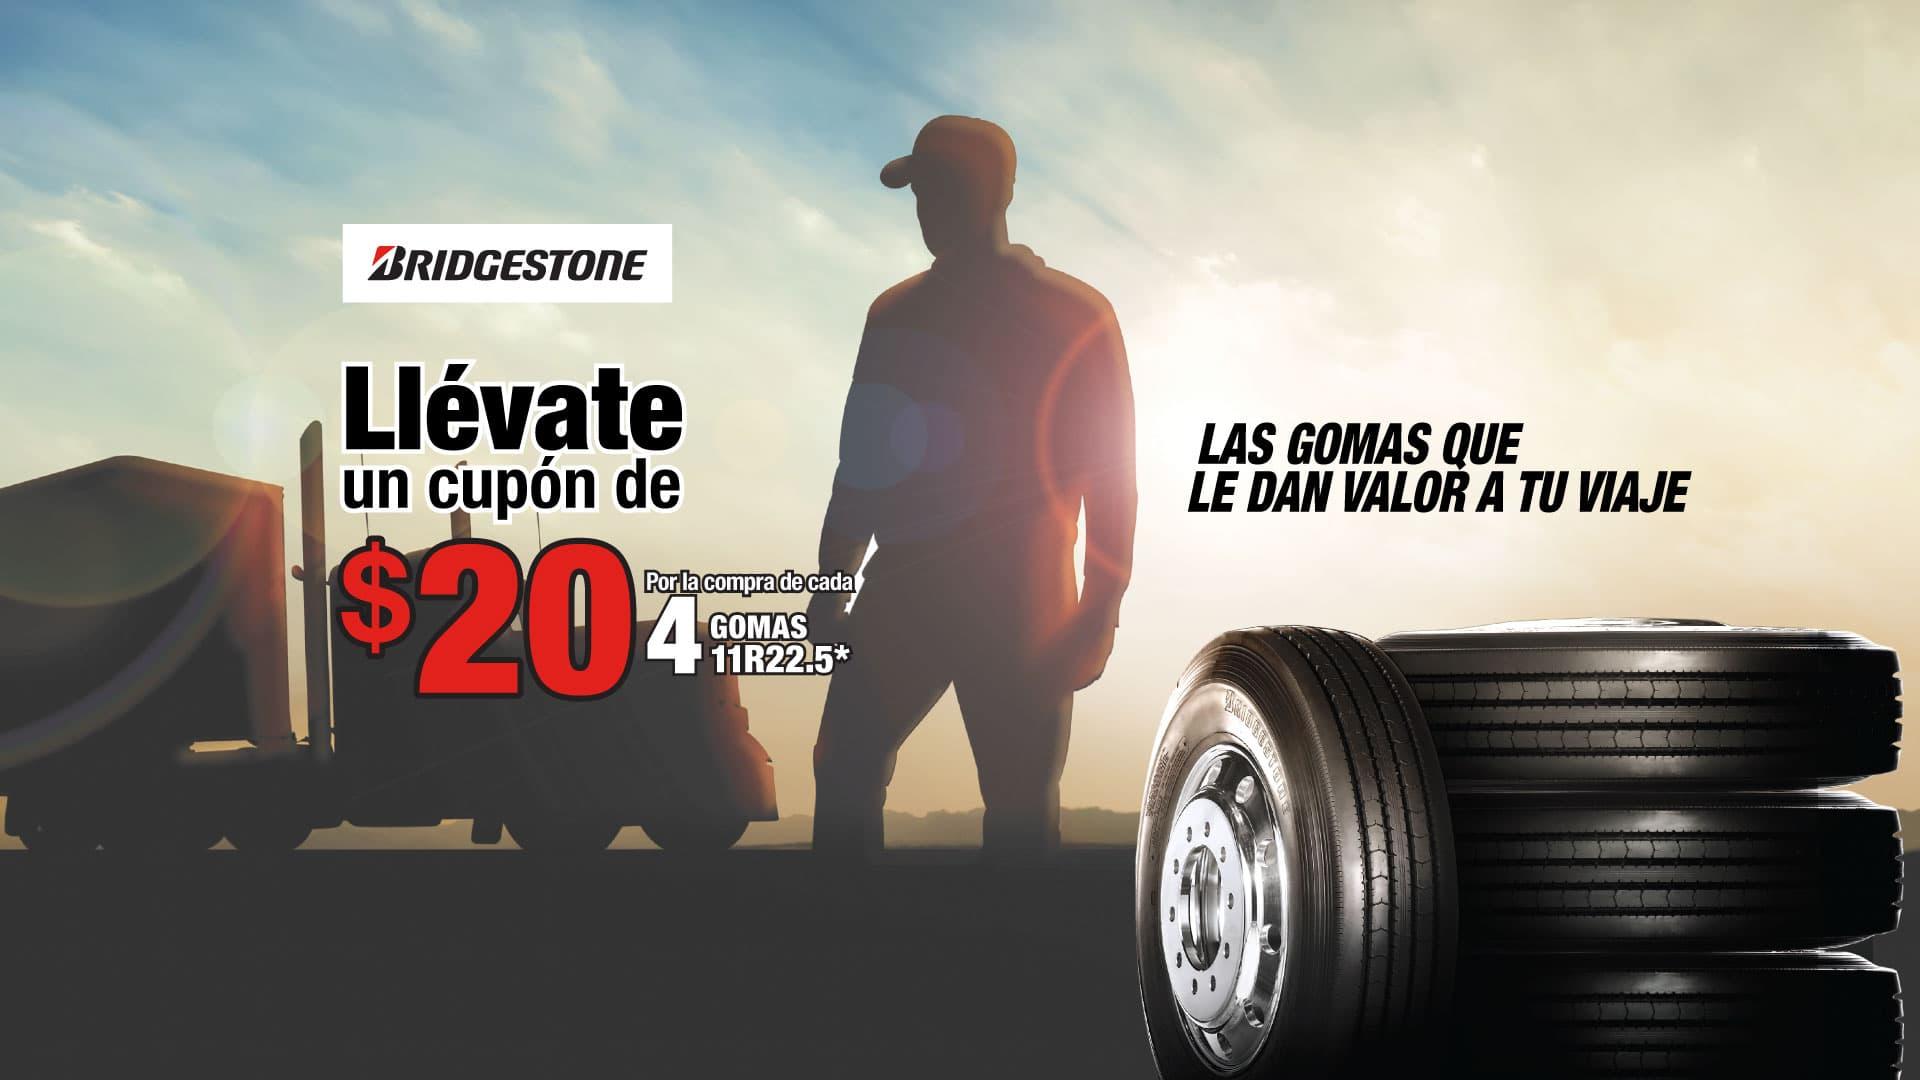 Oferta Bridgestone $20 Dólares